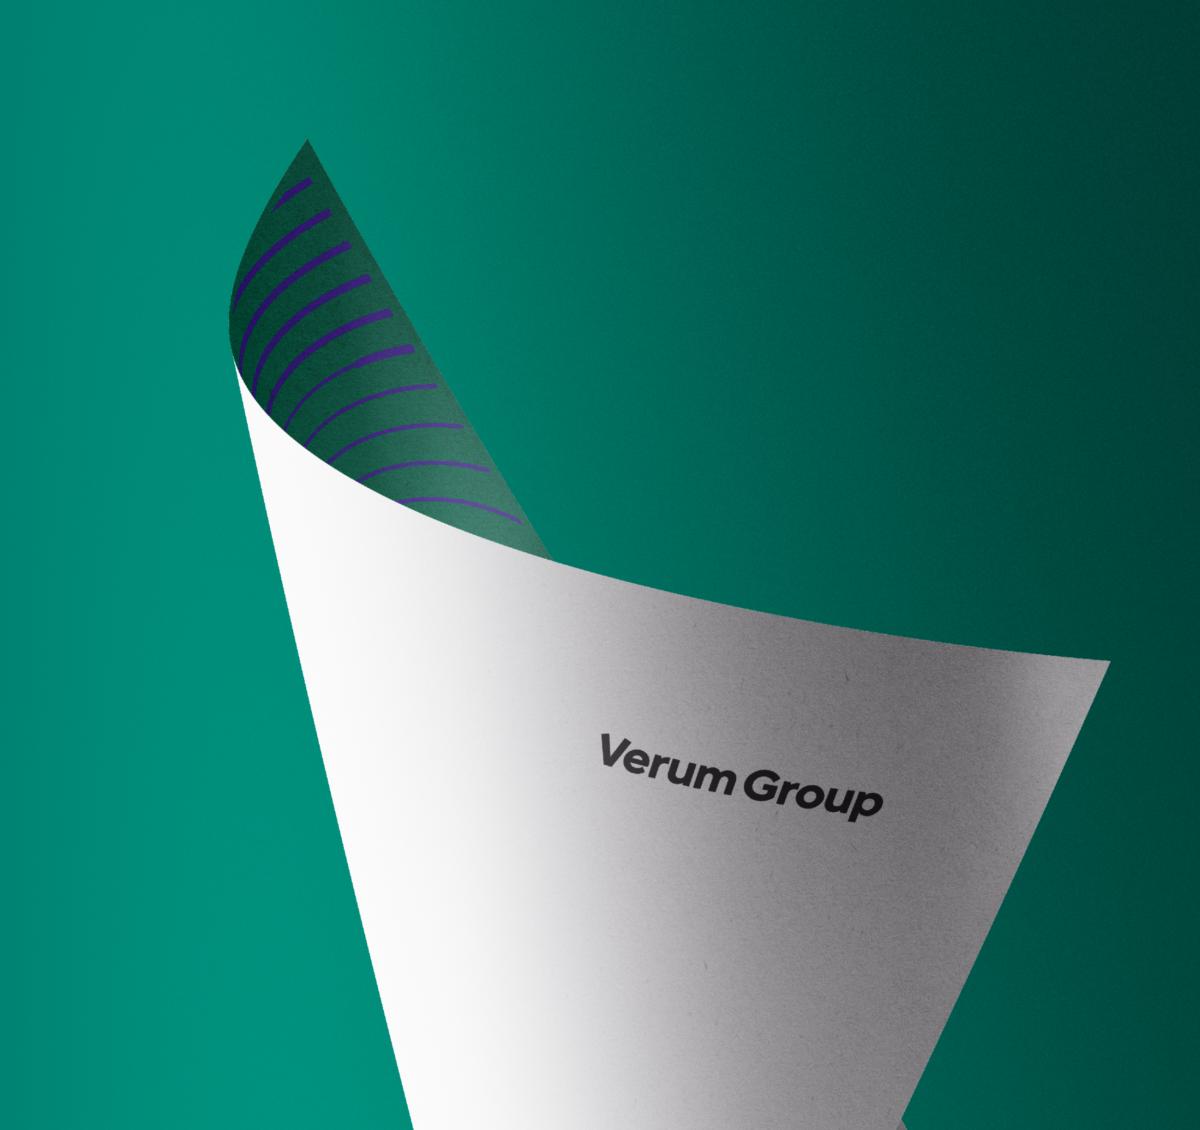 Verum Group 2020 4